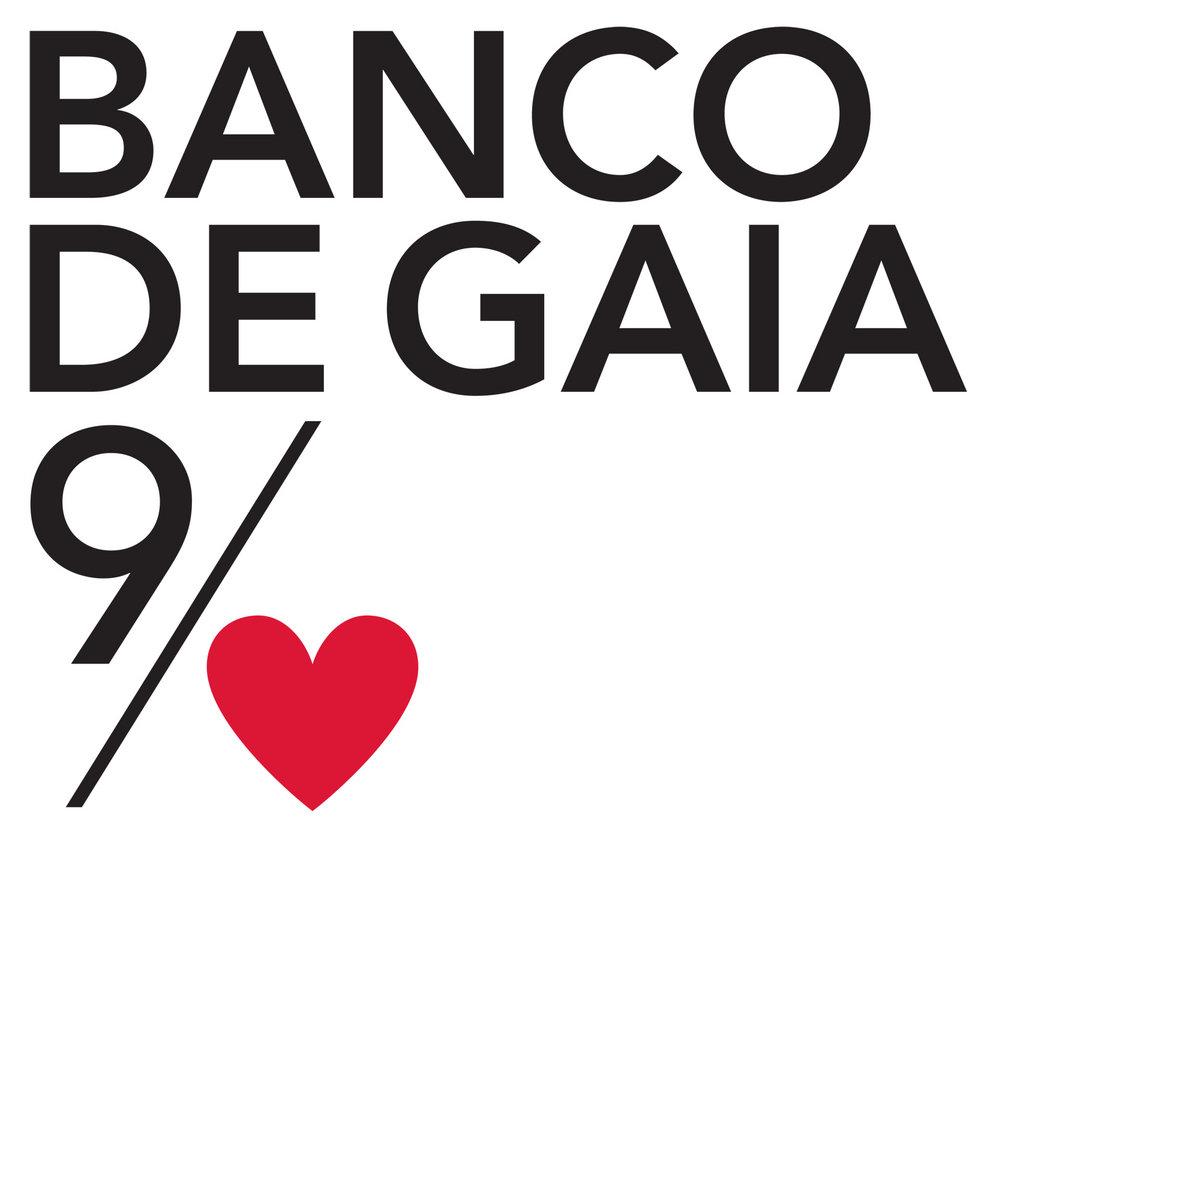 The 9th of Nine Hearts | Banco De Gaia